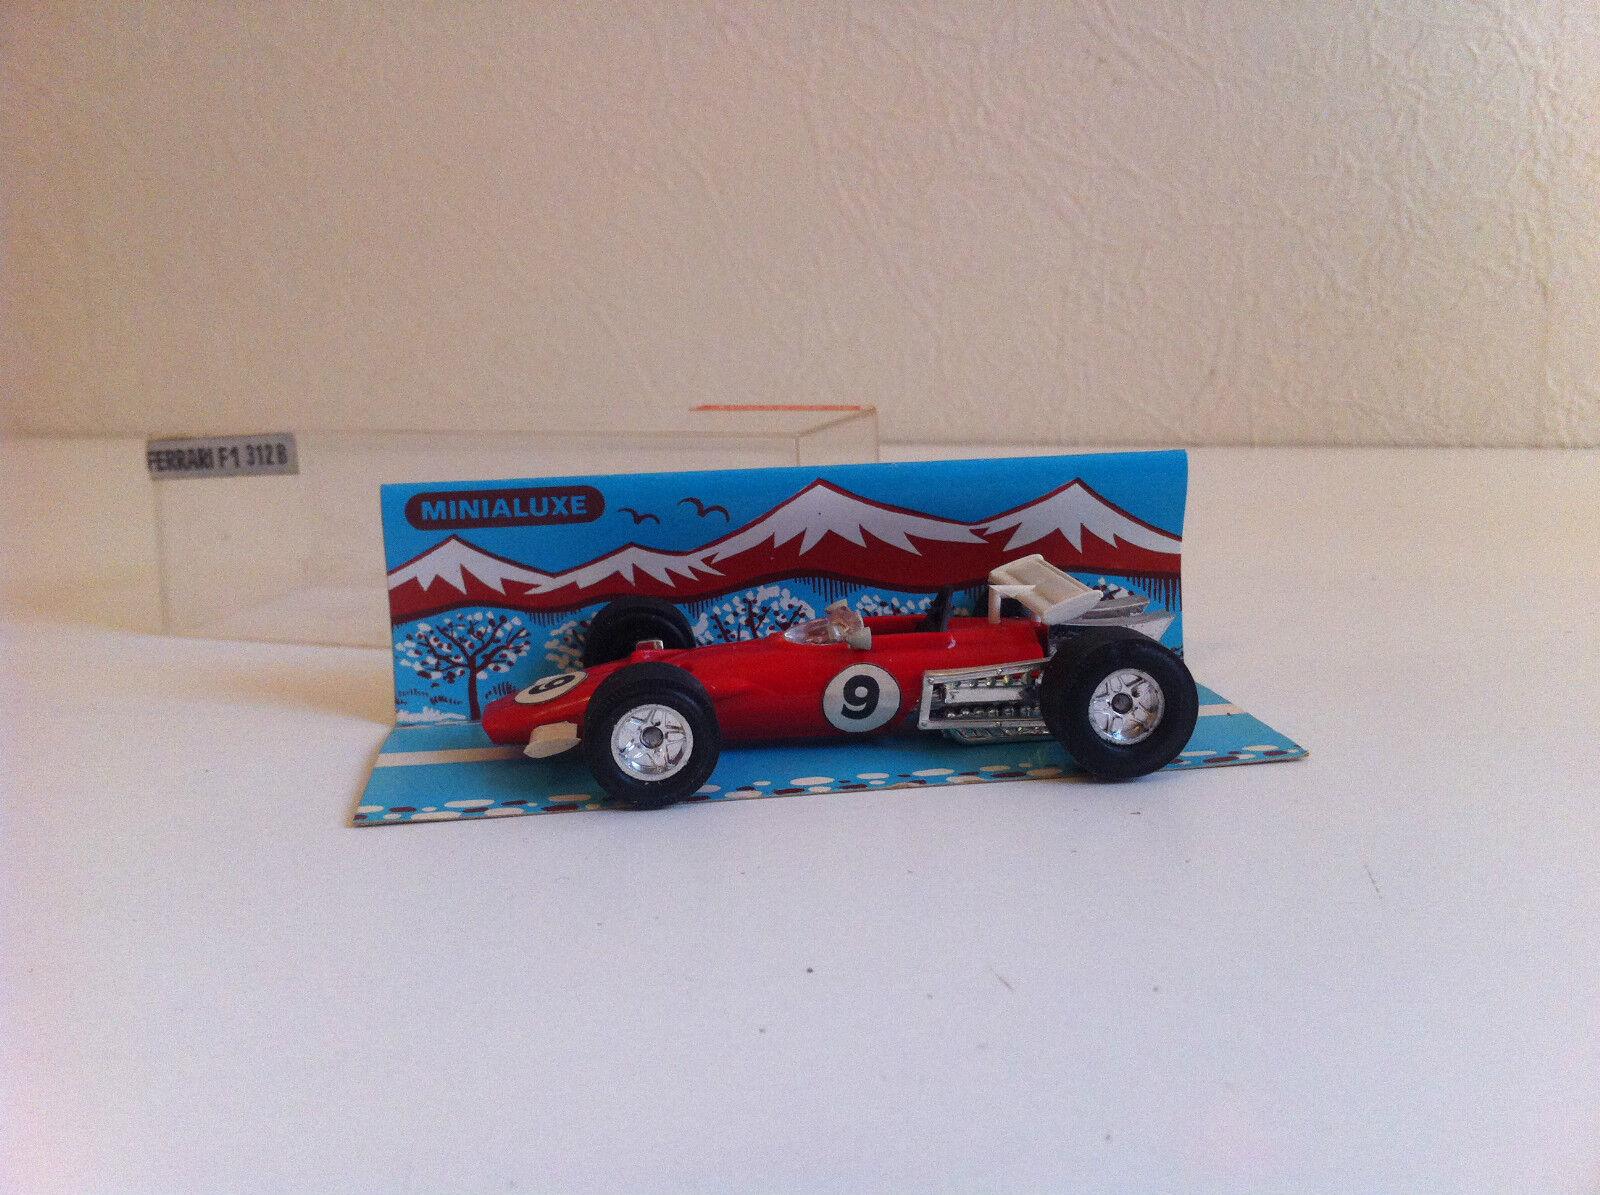 Minialuxe - Ferrari F1 312B en plastique (1 43)